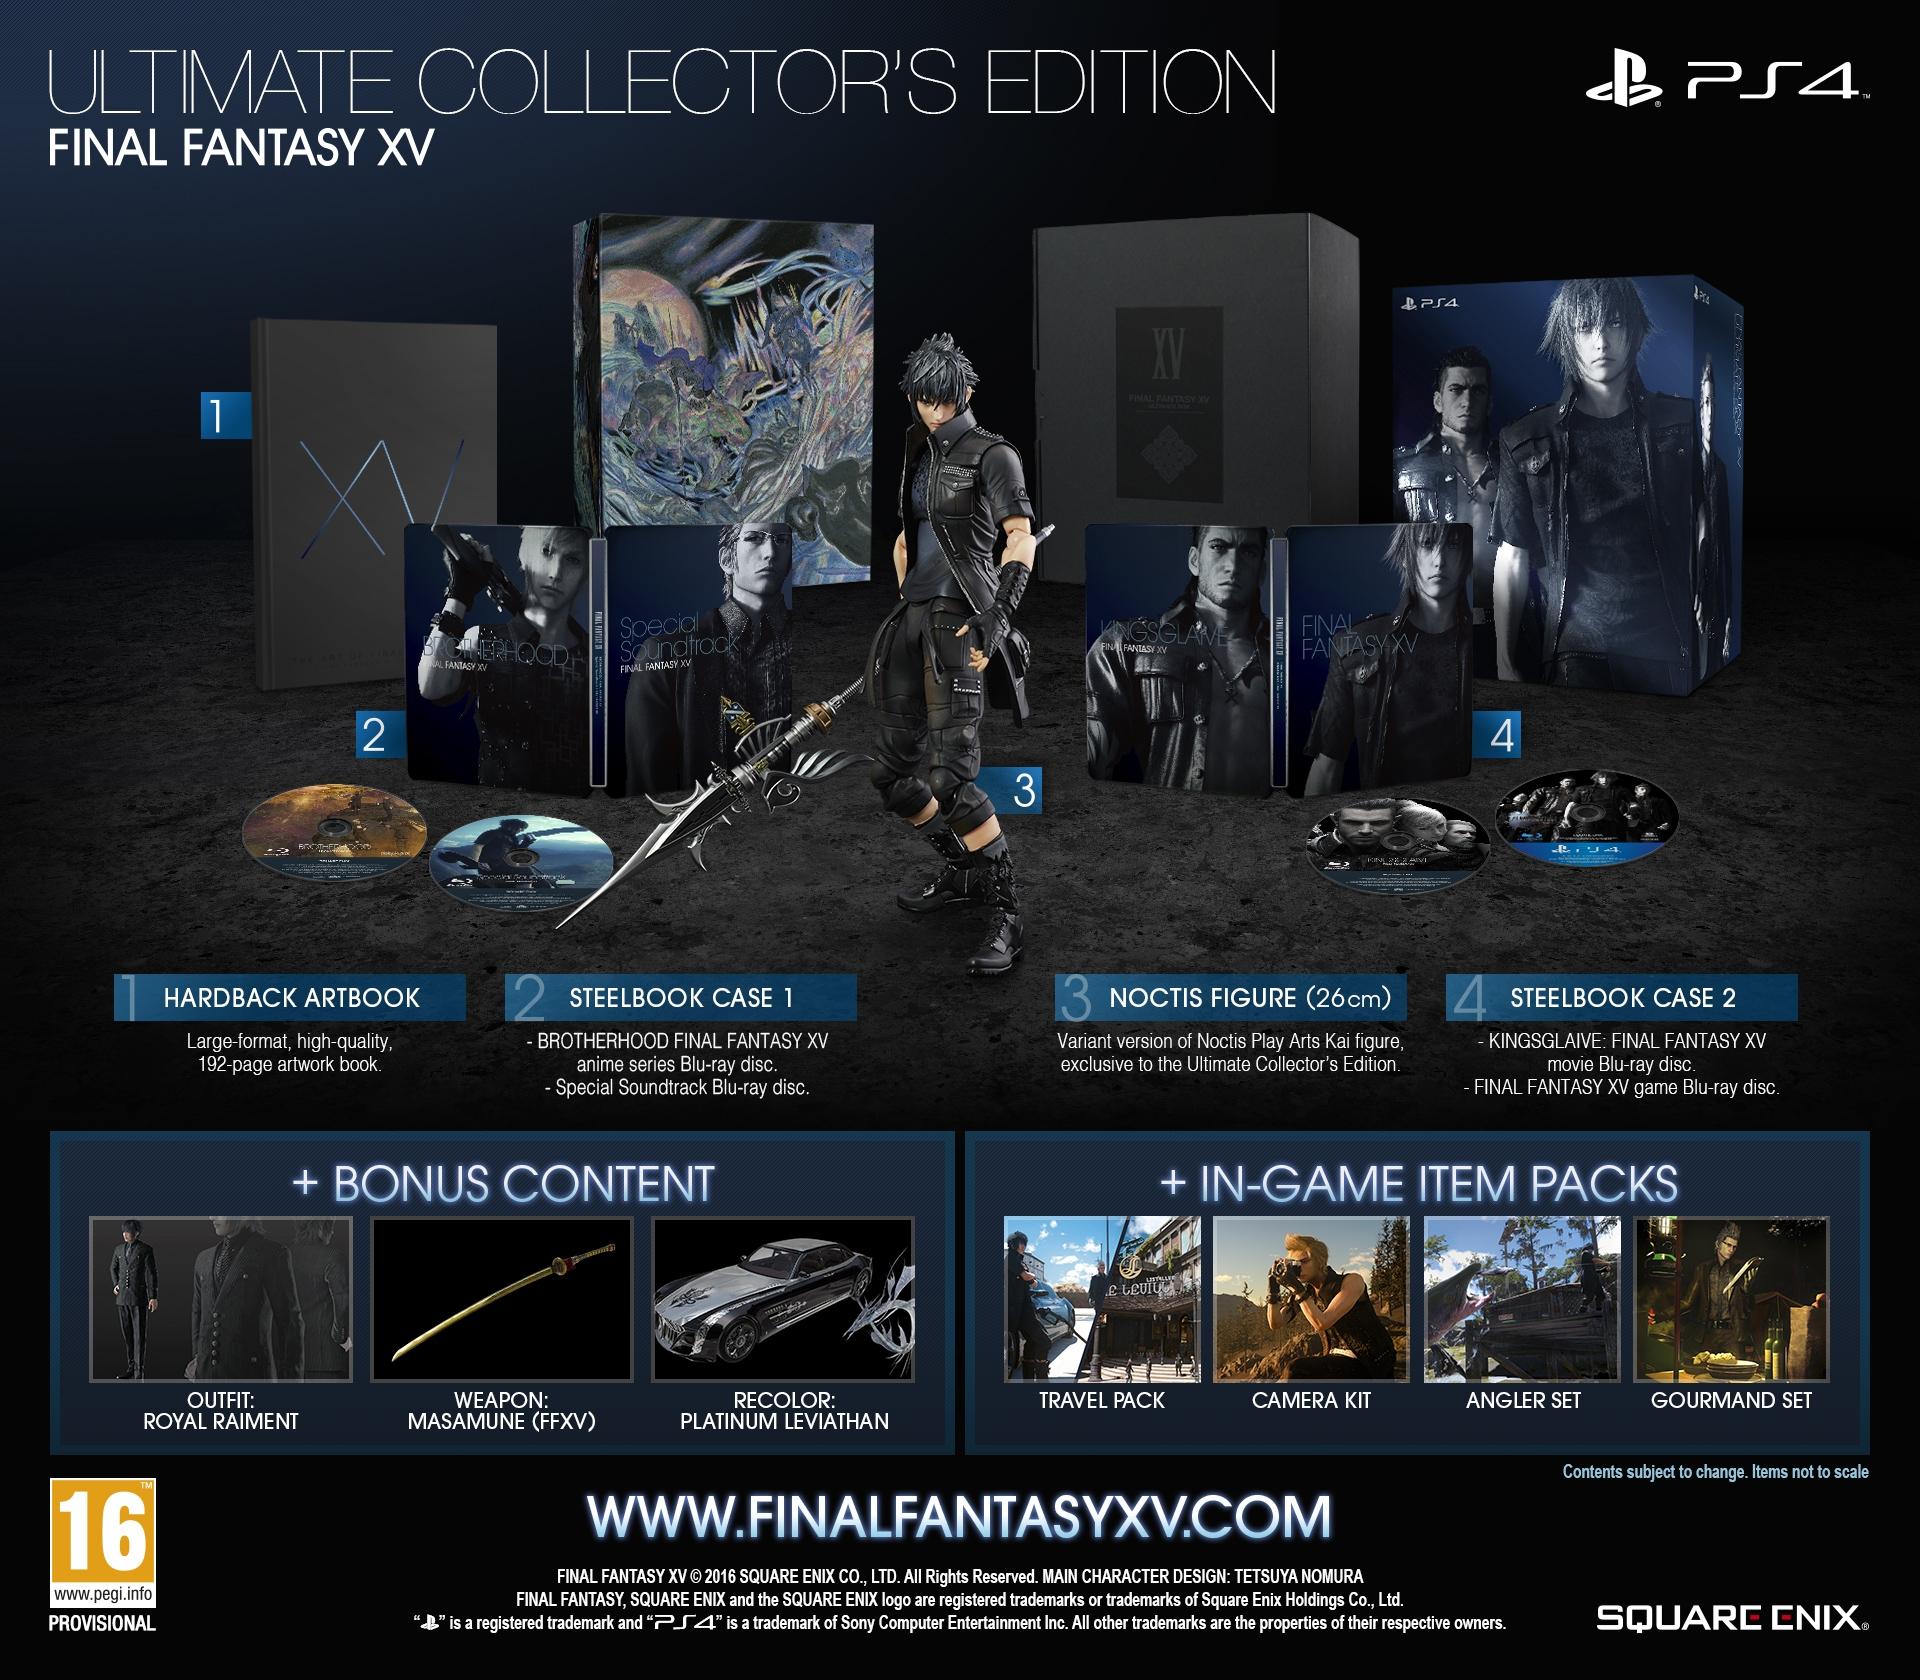 Final fantasy 15 collector